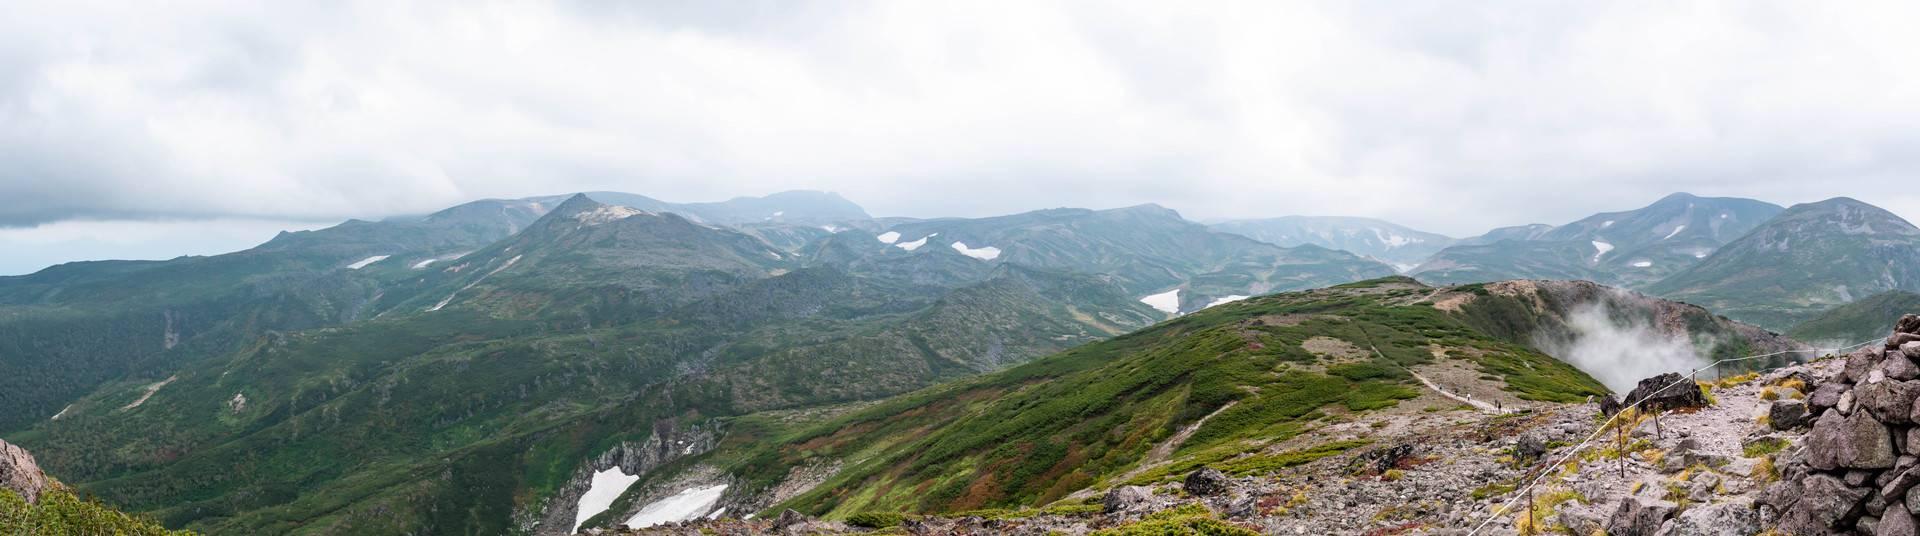 黒岳山頂の風景